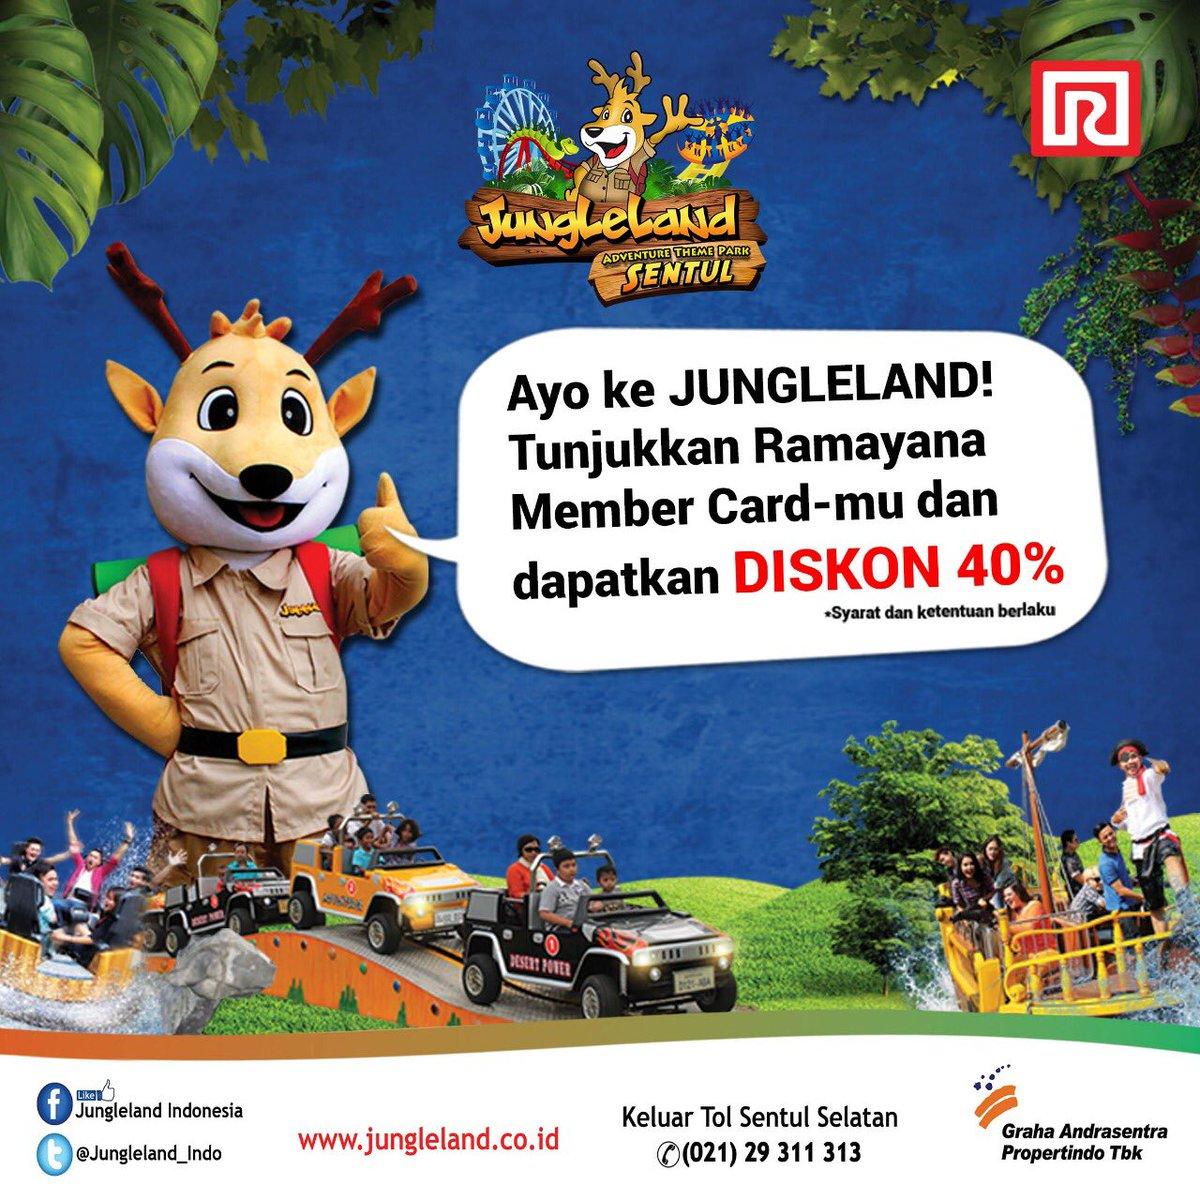 Ramayana - Promo Diskon 40% di JungleLand Pakai Kartu Ramayana